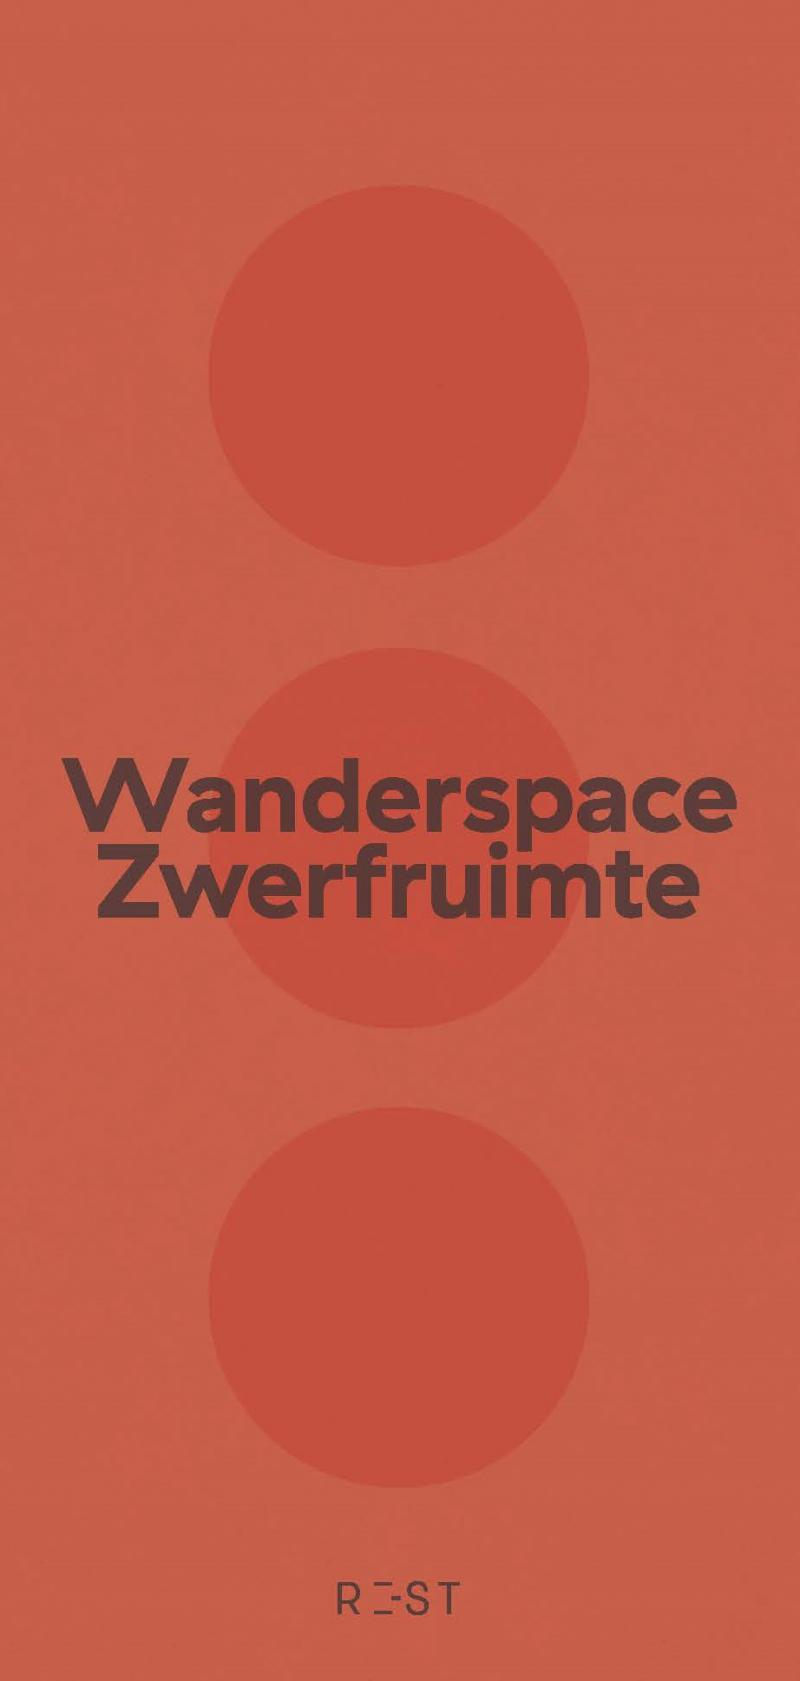 Wanderspace / Zwerfruimte